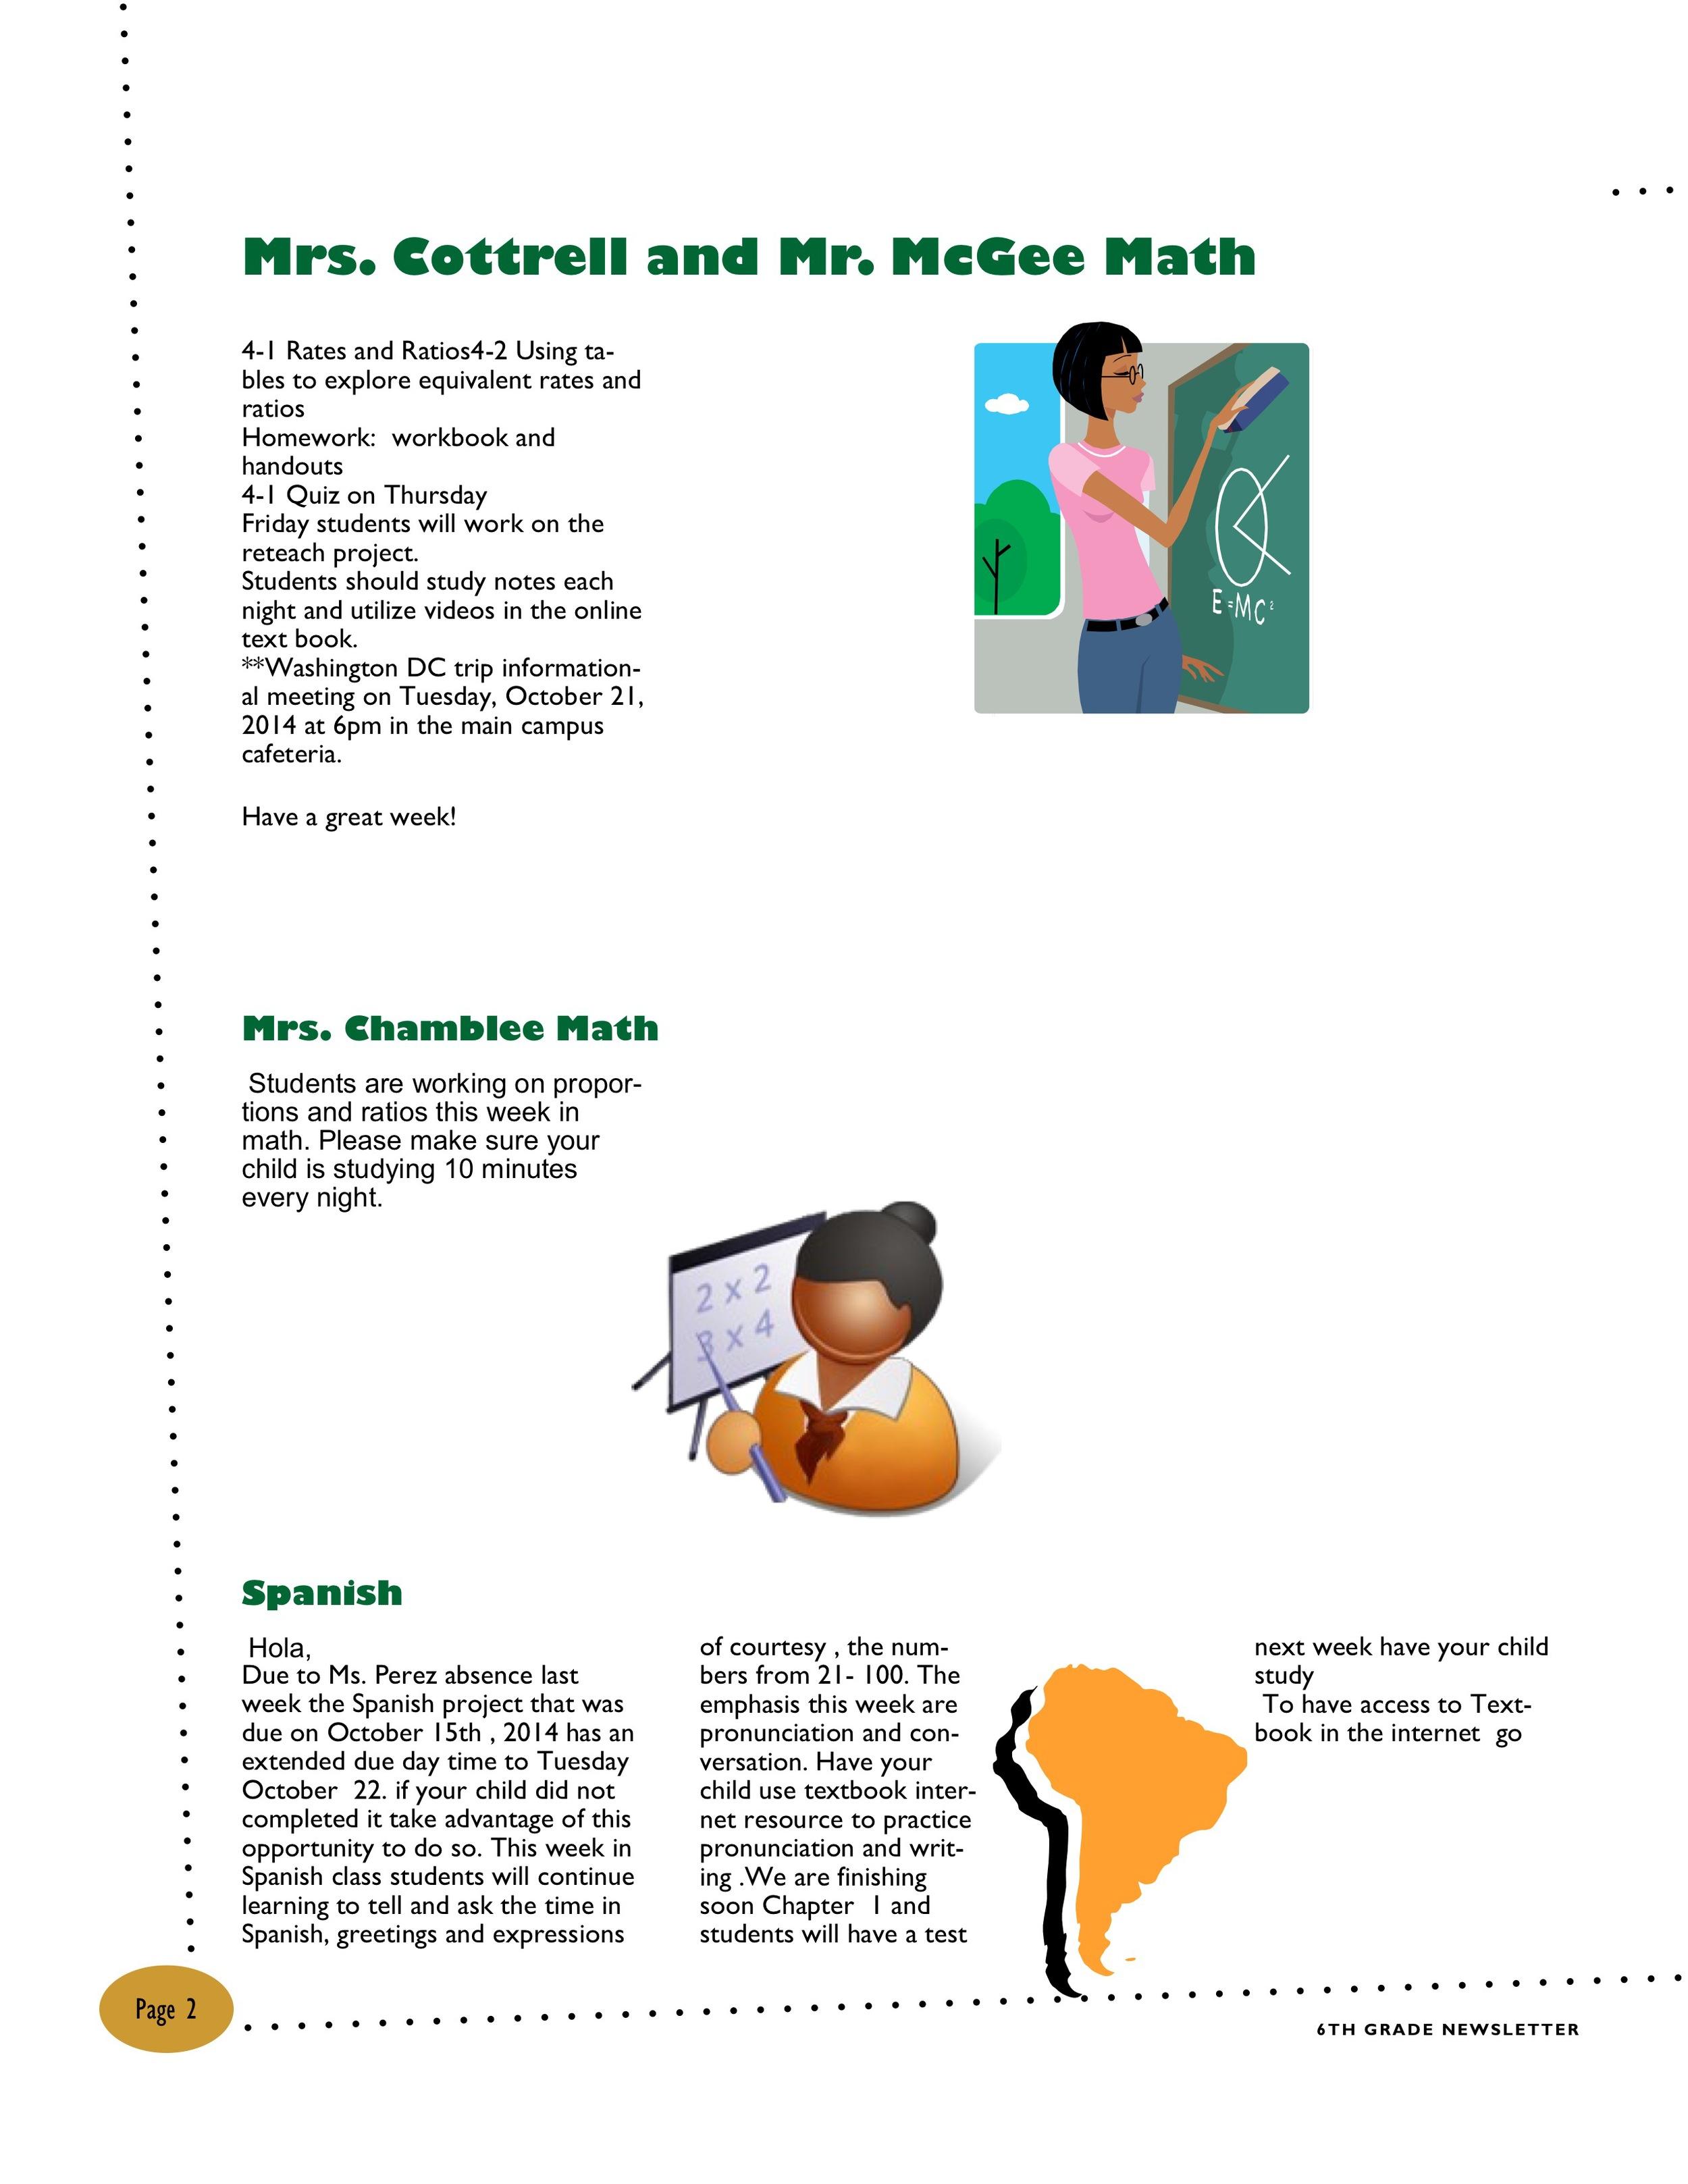 Newsletter Image6th grade 10-20 2.jpeg